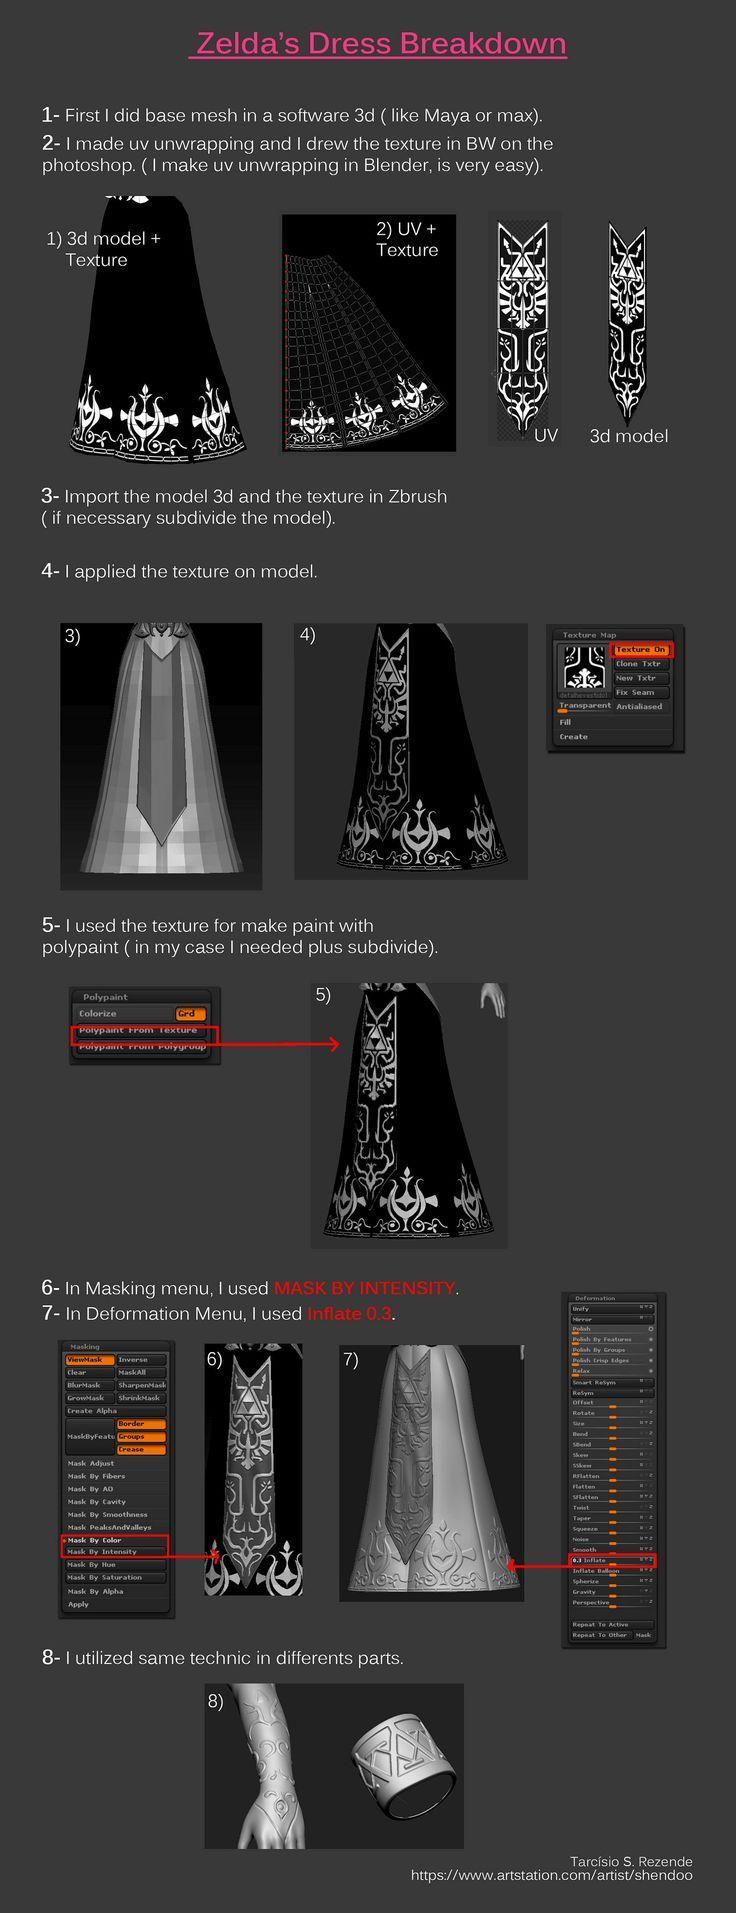 tarcisio-rezende- Zelda dress-breakdown.jpg